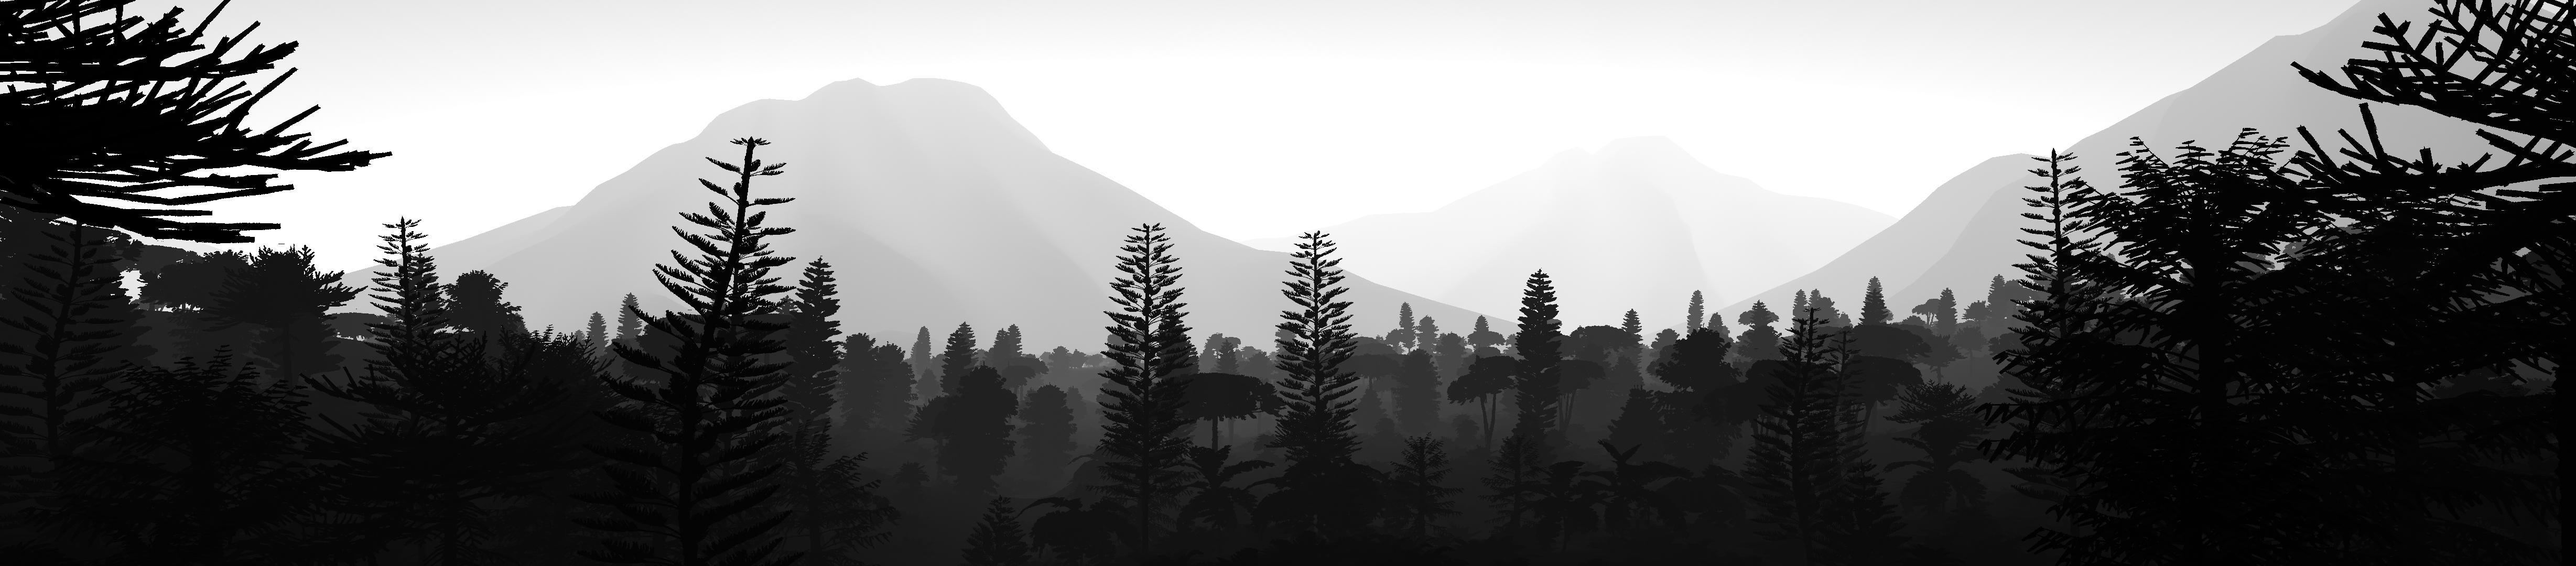 Jurassic depth of field by Itsmil